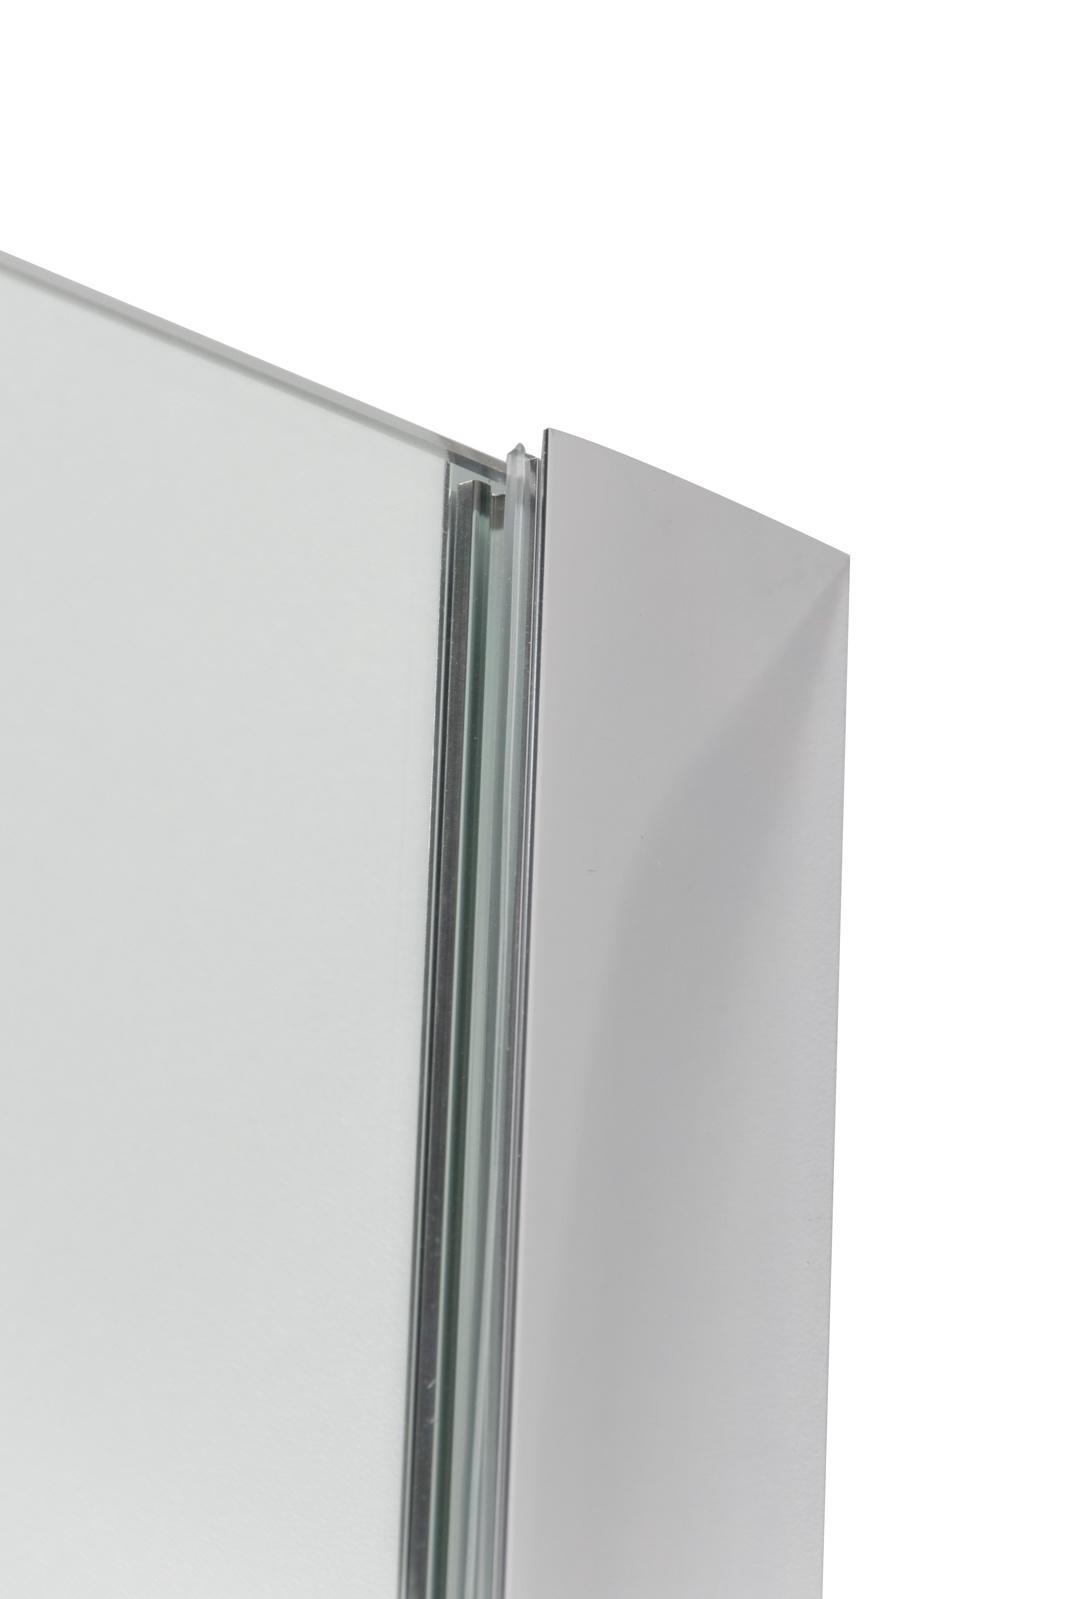 Linea Uno Set Gšteborg 80 x 200 cm + Tulta Seitenwand 35 x 200 cm